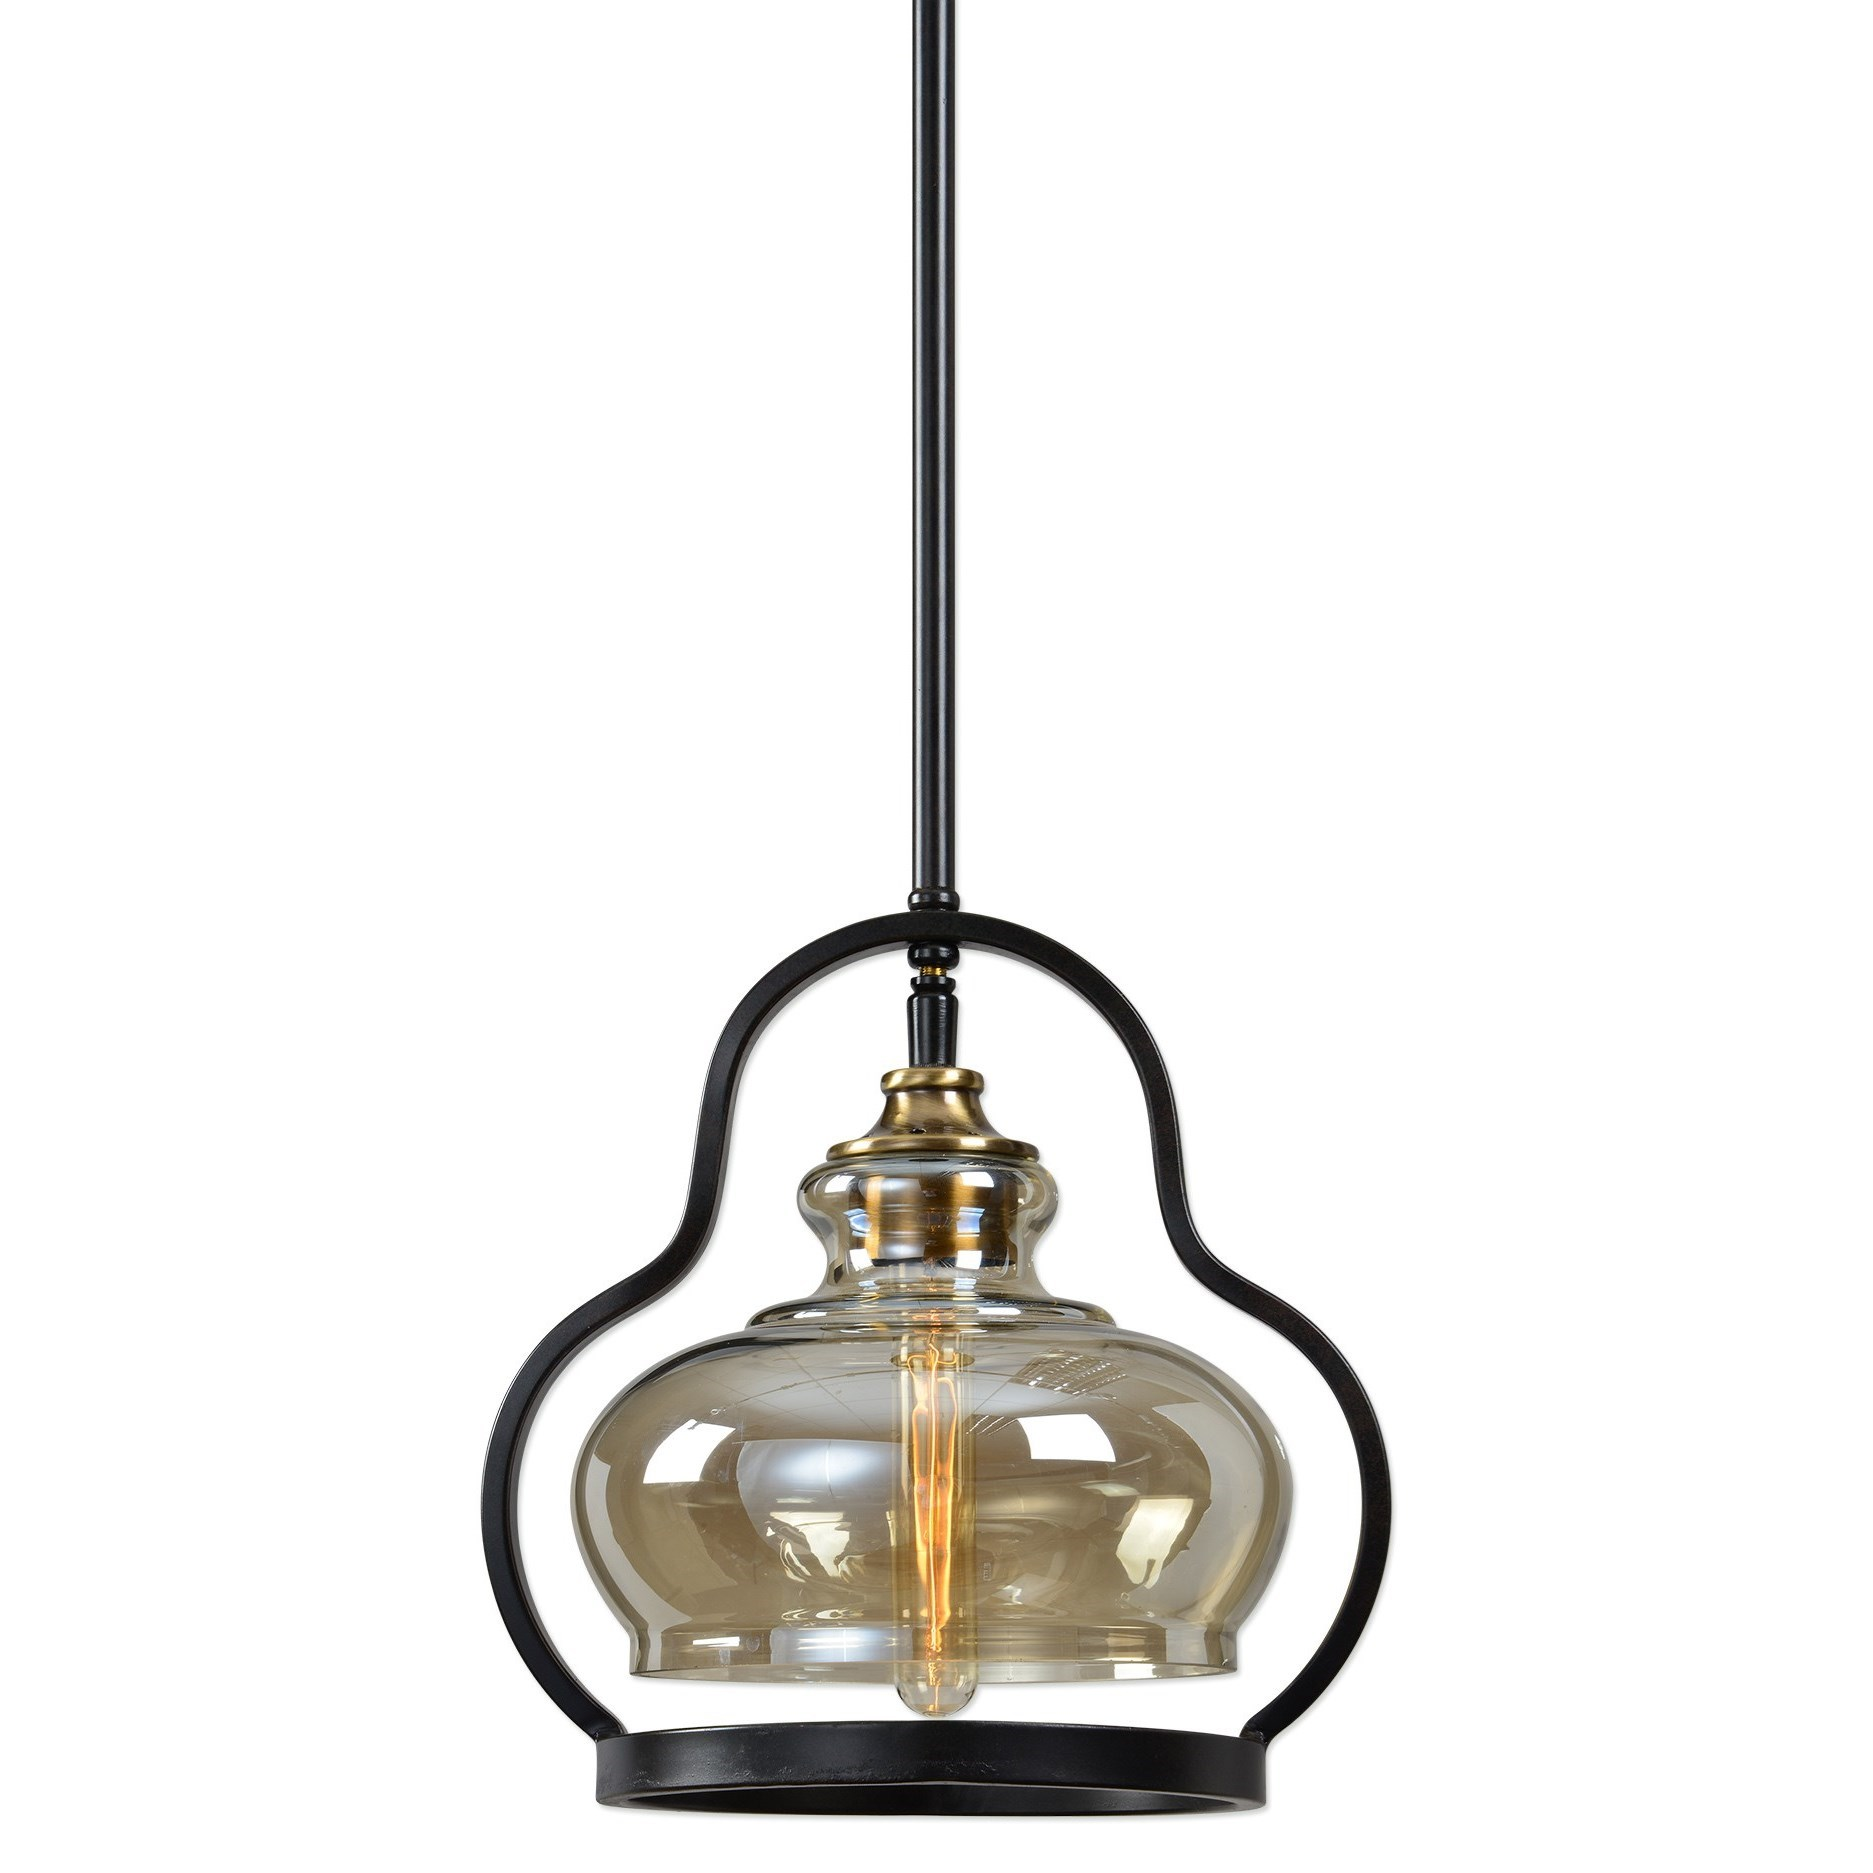 Lighting Fixtures - Pendant Lights  Cotulla 1 Lt. Mini Pendant by Uttermost at Mueller Furniture